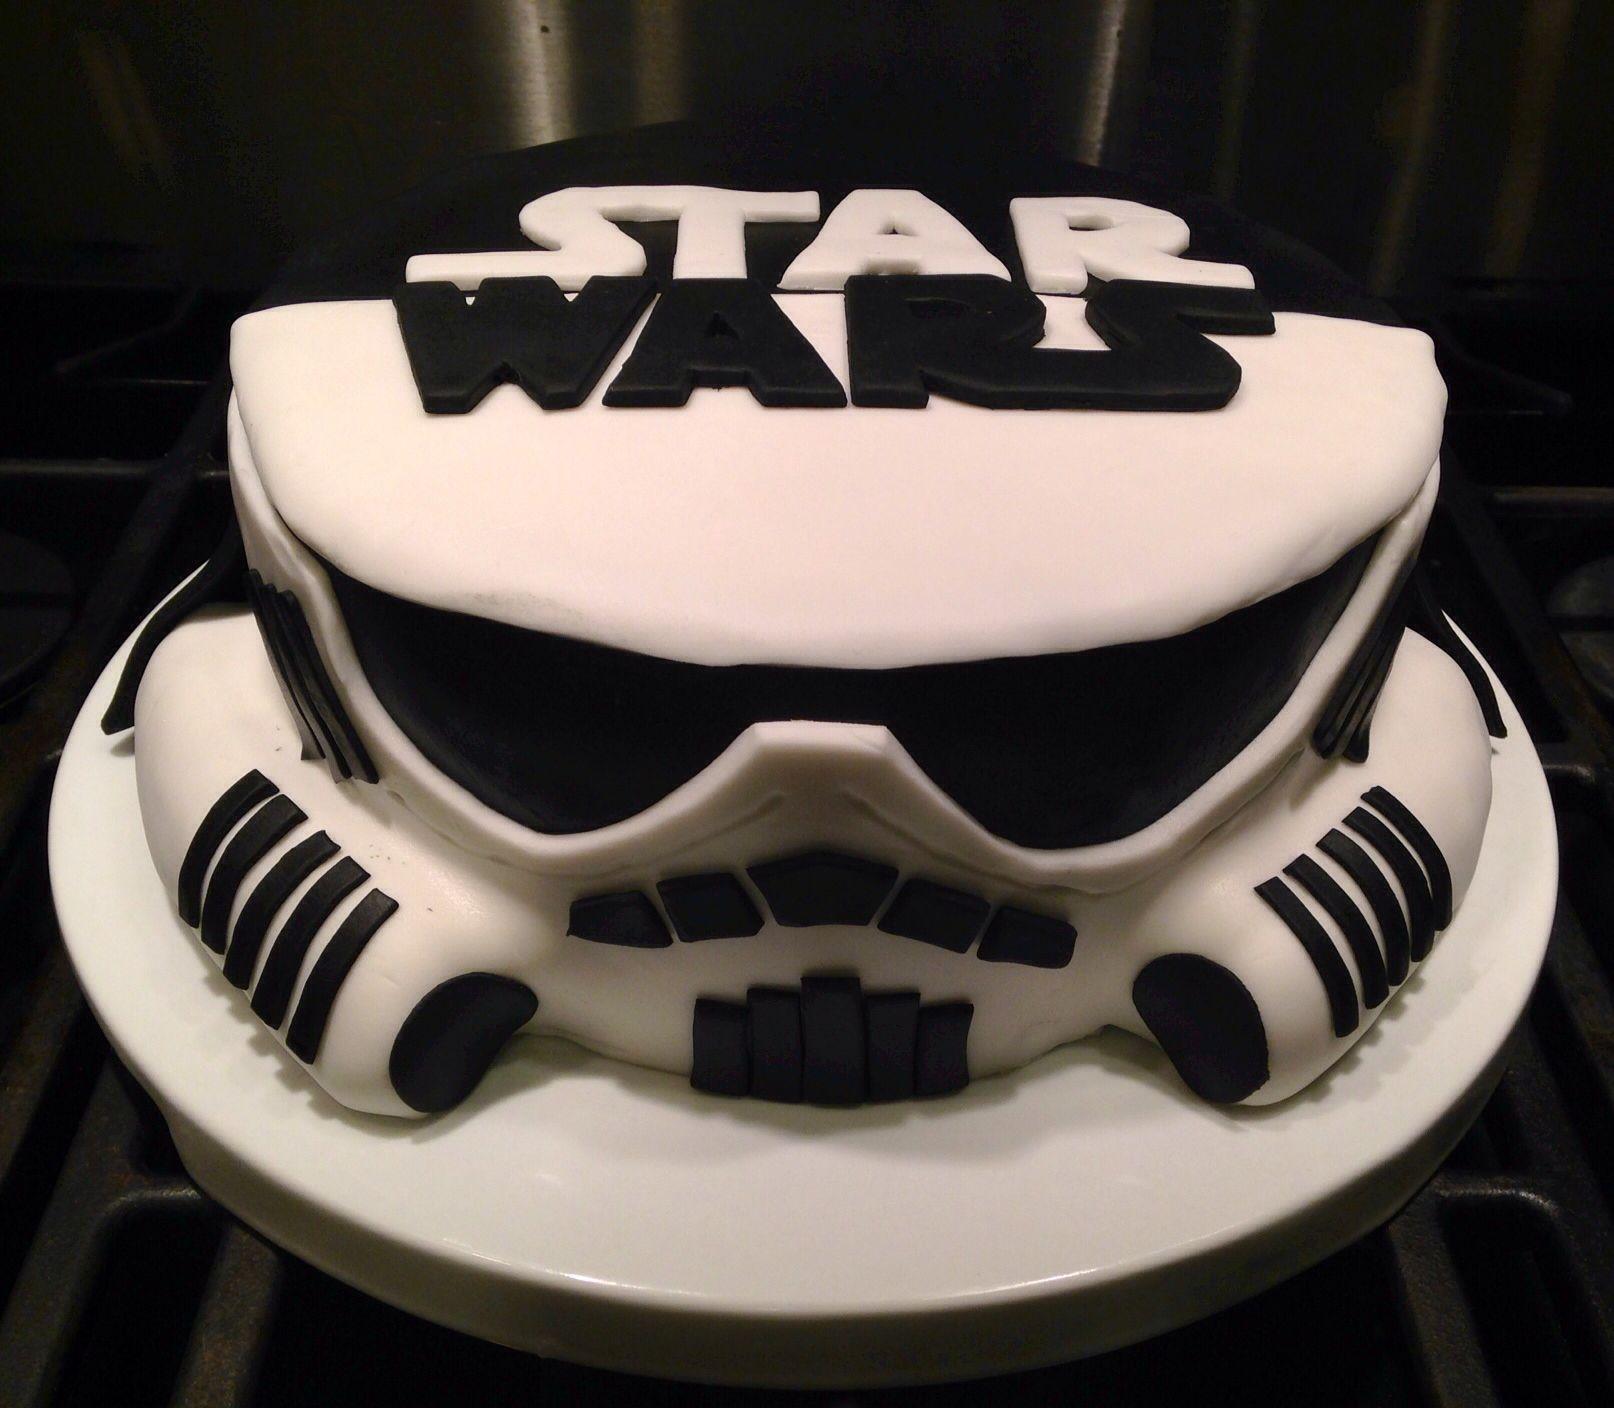 Star Wars Stormtrooper And Darth Vader Cake Lol In 2018